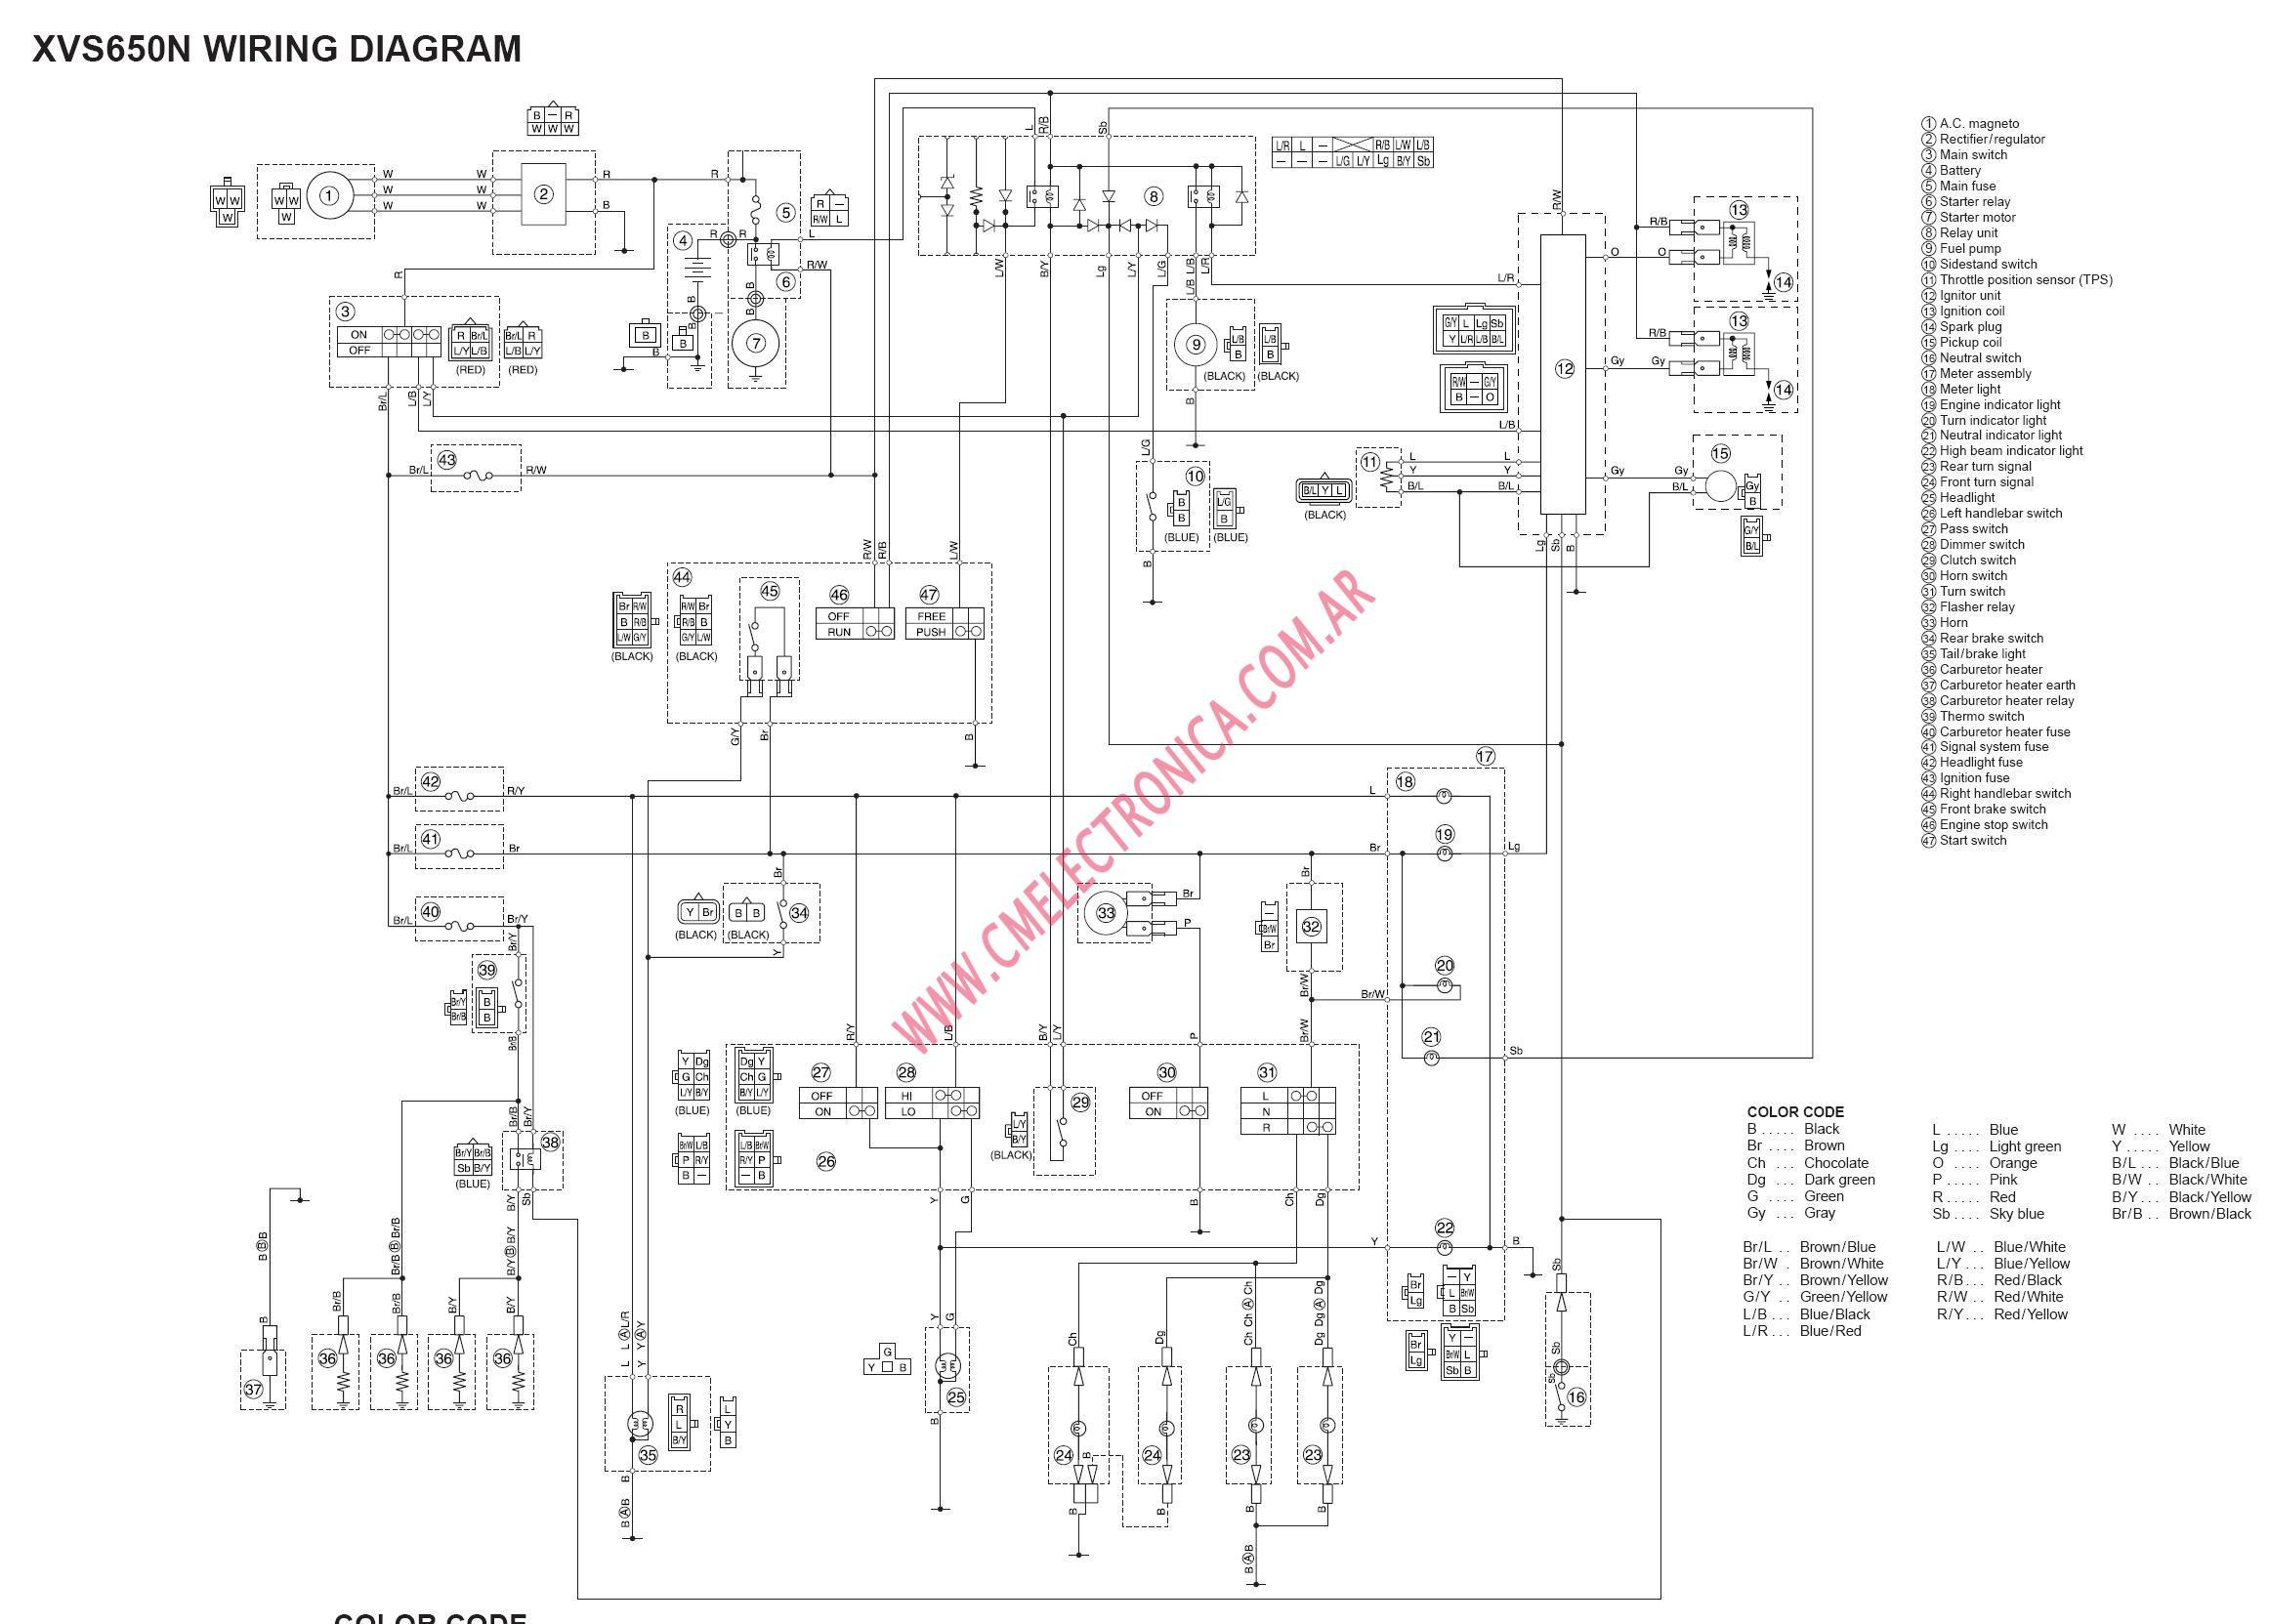 2007 yamaha v star 250 wiring diagram index listing of wiring diagrams